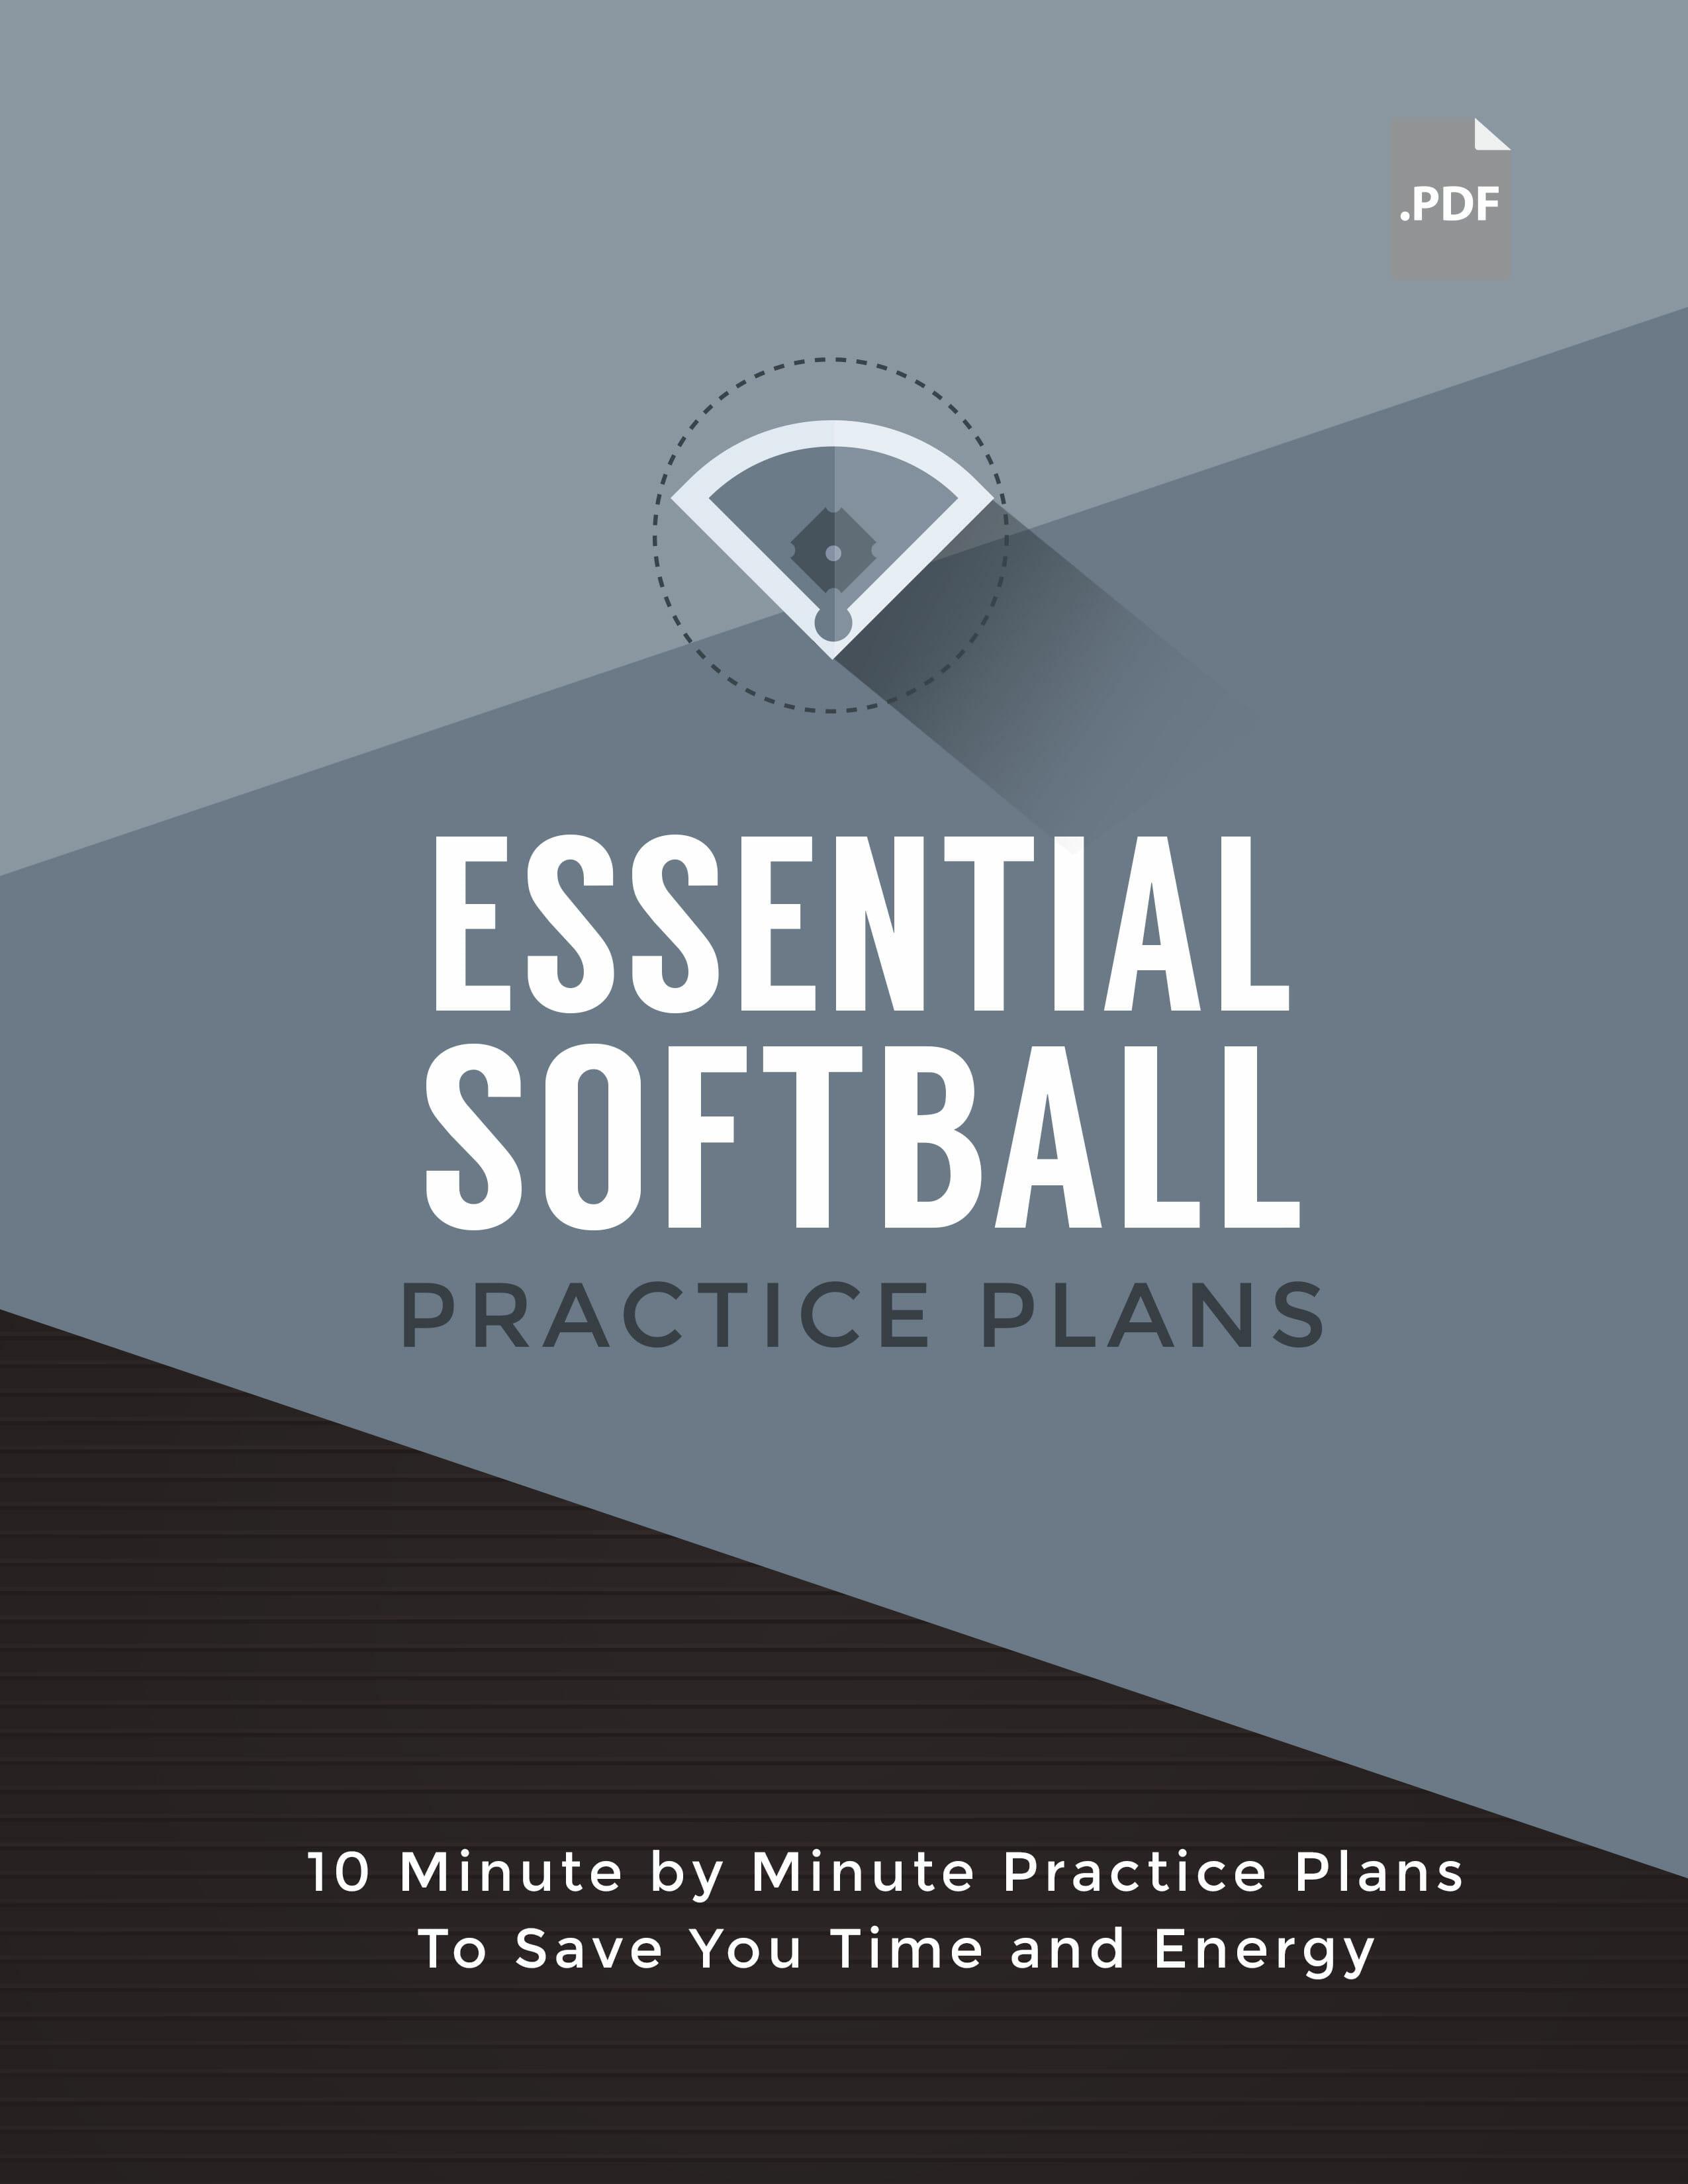 Essential Softball Practice Plans